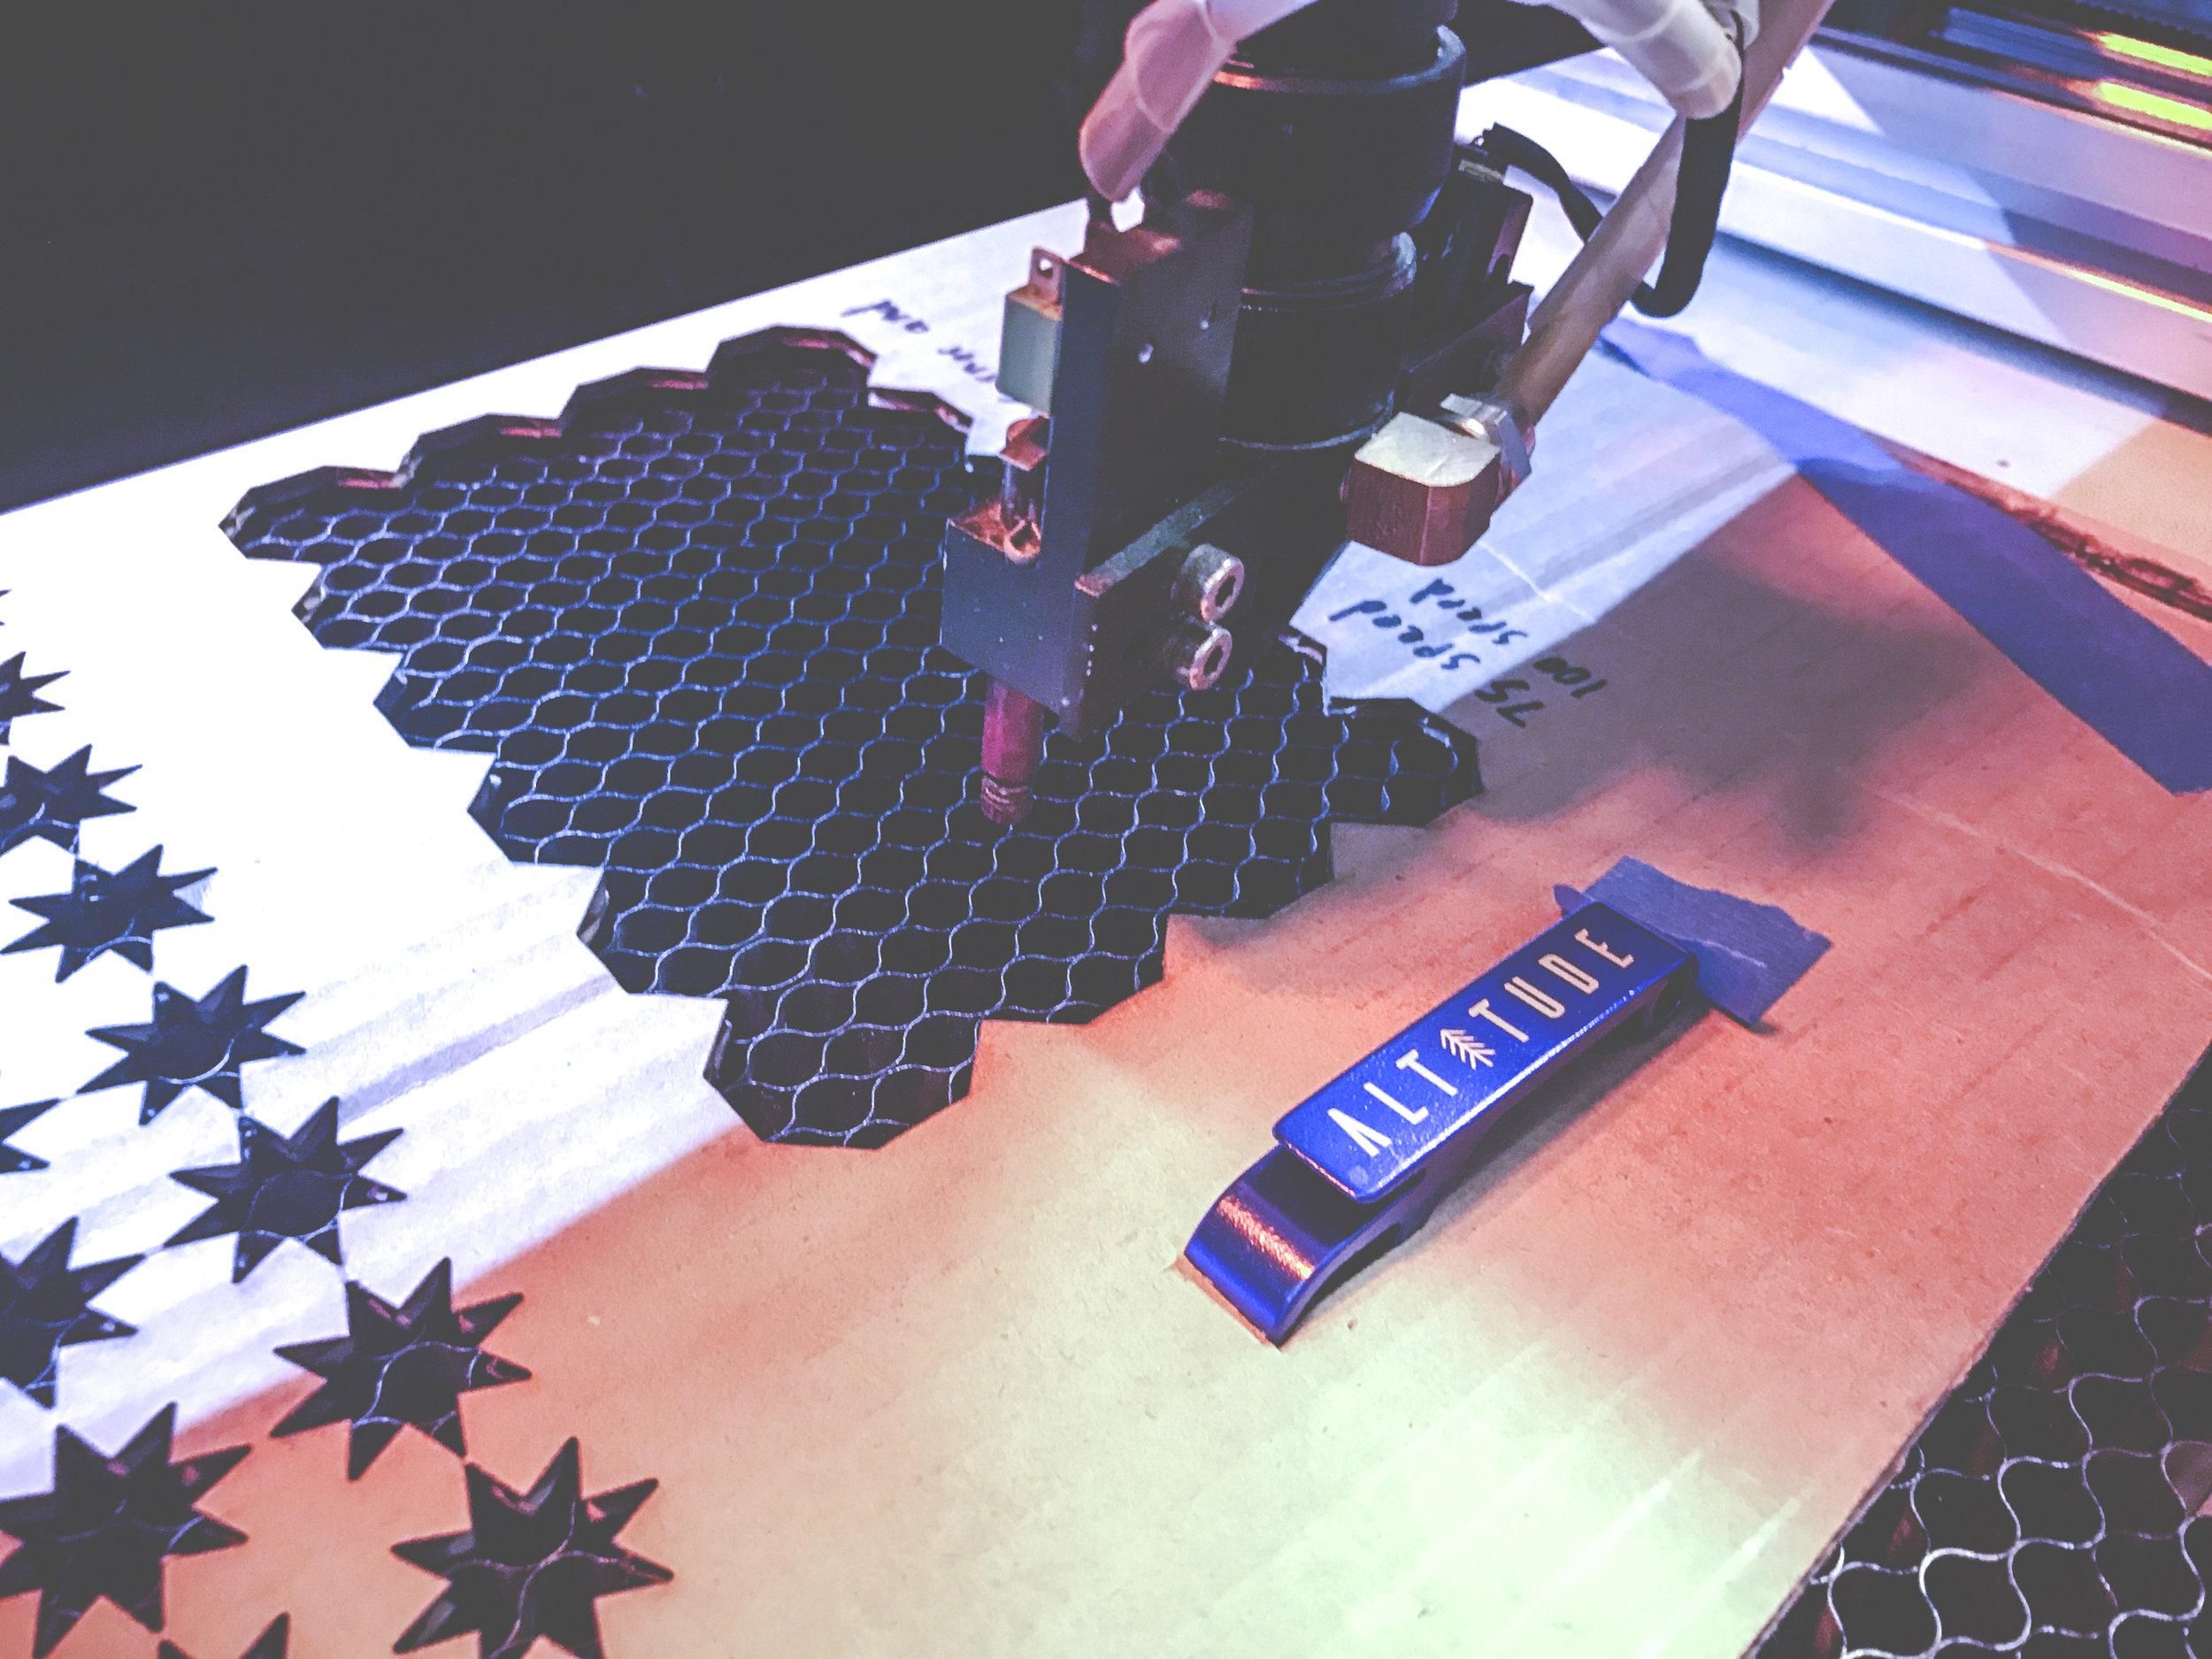 Laser Cut Anodized Aluminum Keychain